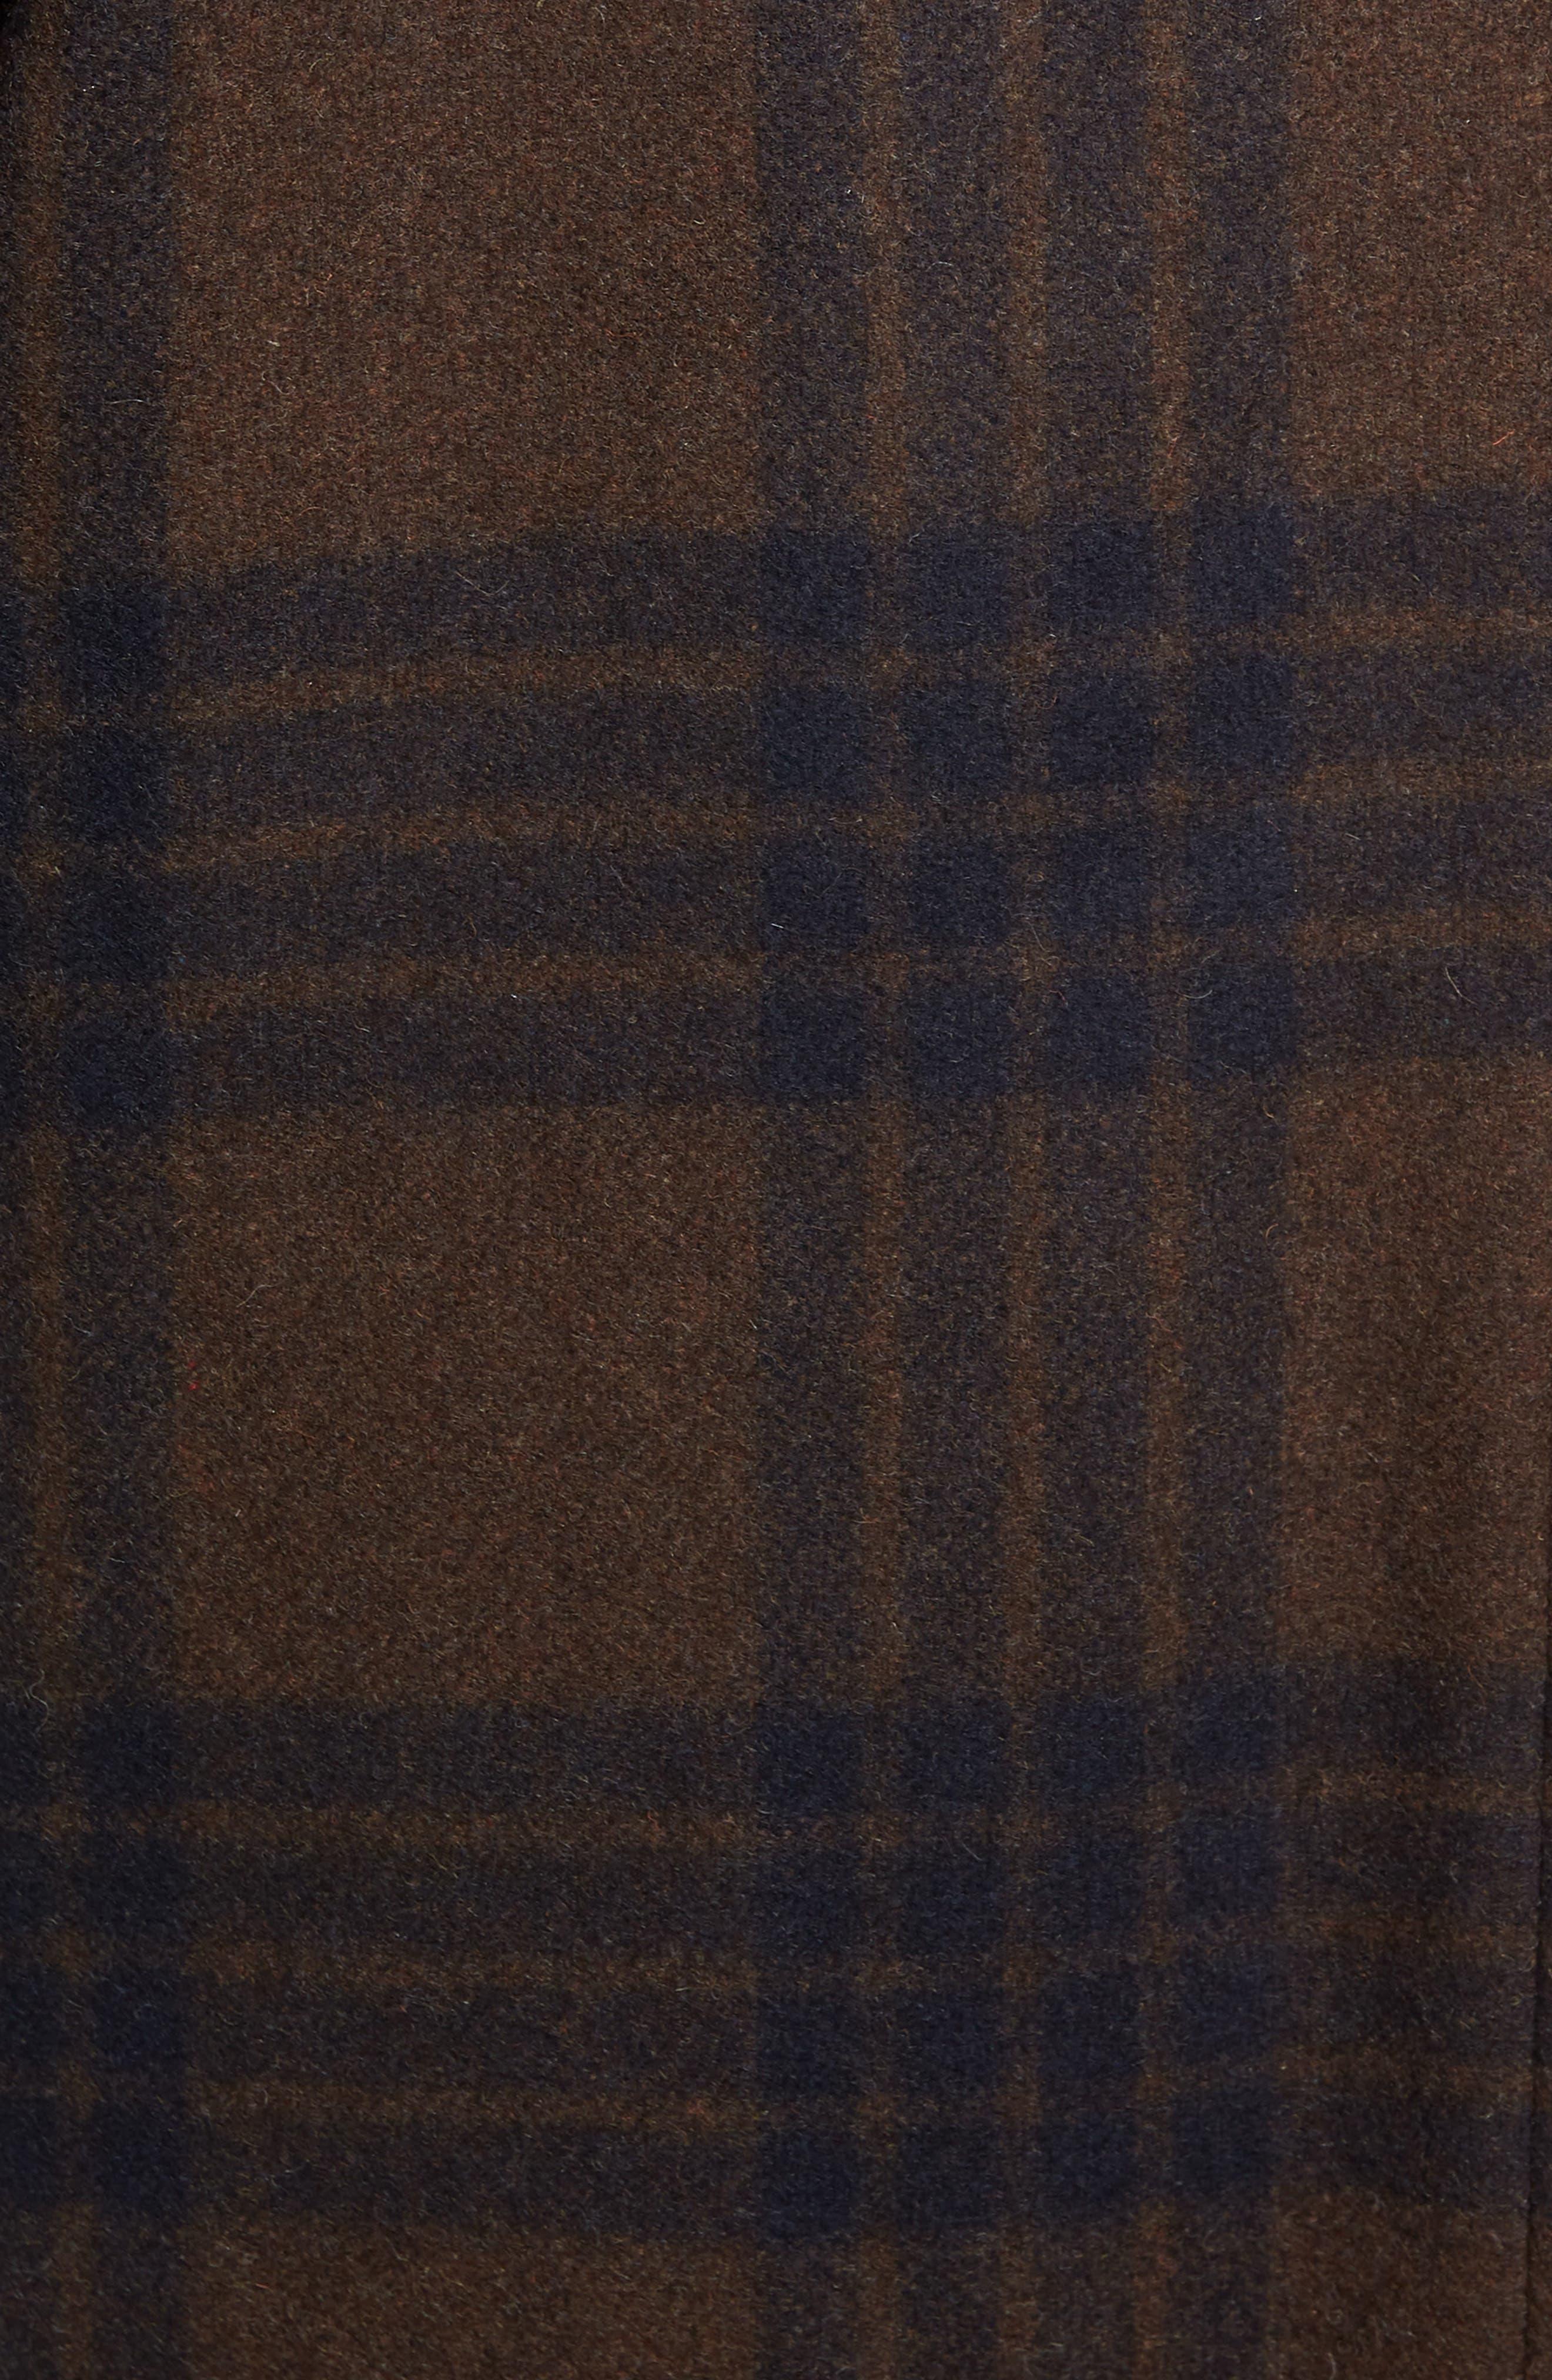 Plaid Duffle Coat with Faux Shearling Trim,                             Alternate thumbnail 7, color,                             H. REDWOOD